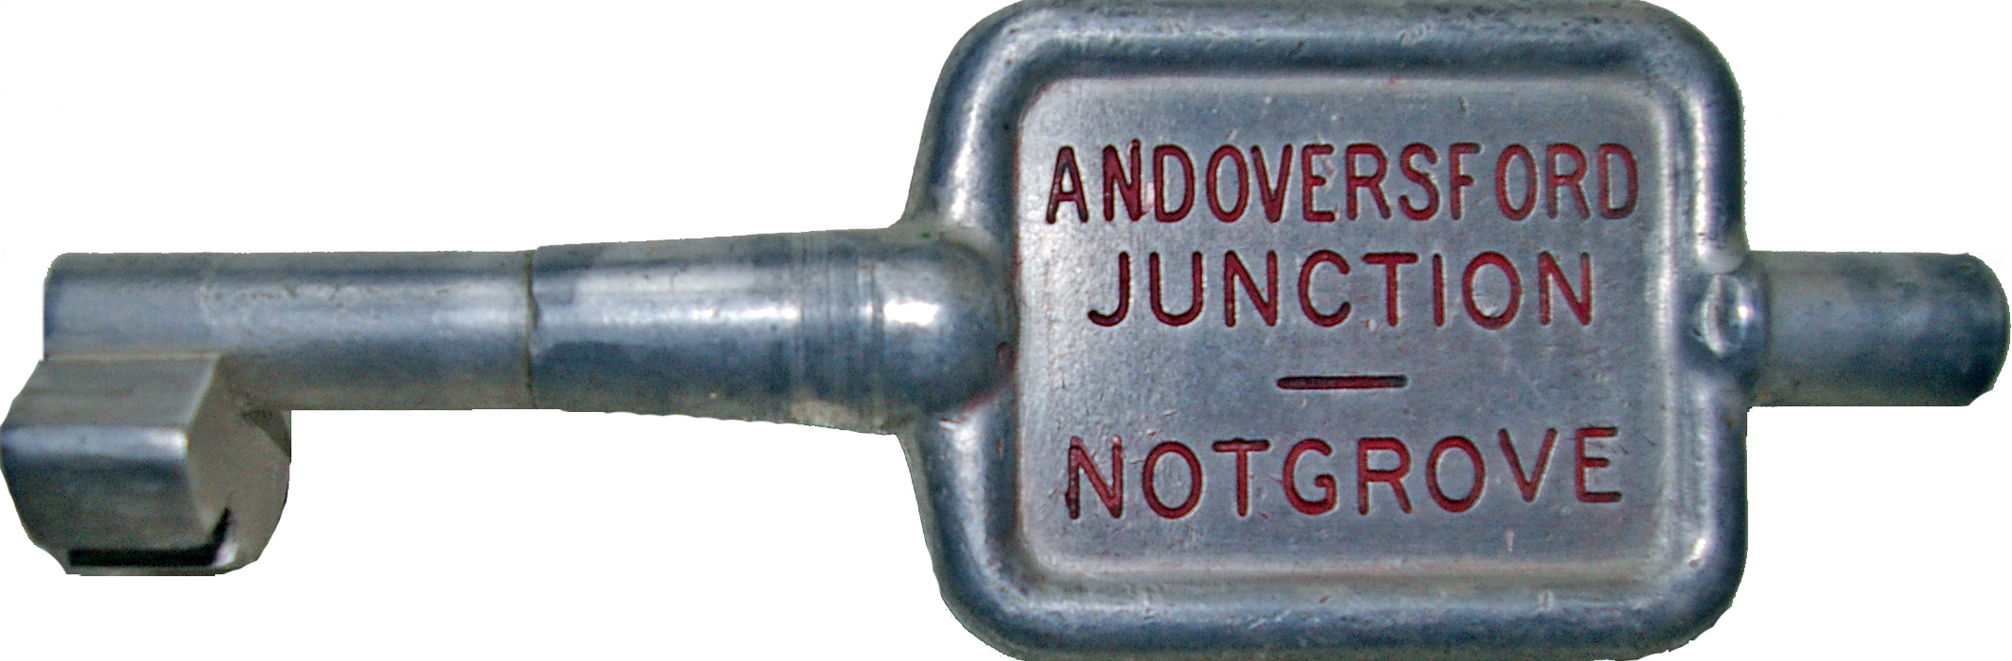 Alloy Key Token ANDOVERSFORD JUNCTION - NOTGROVE.